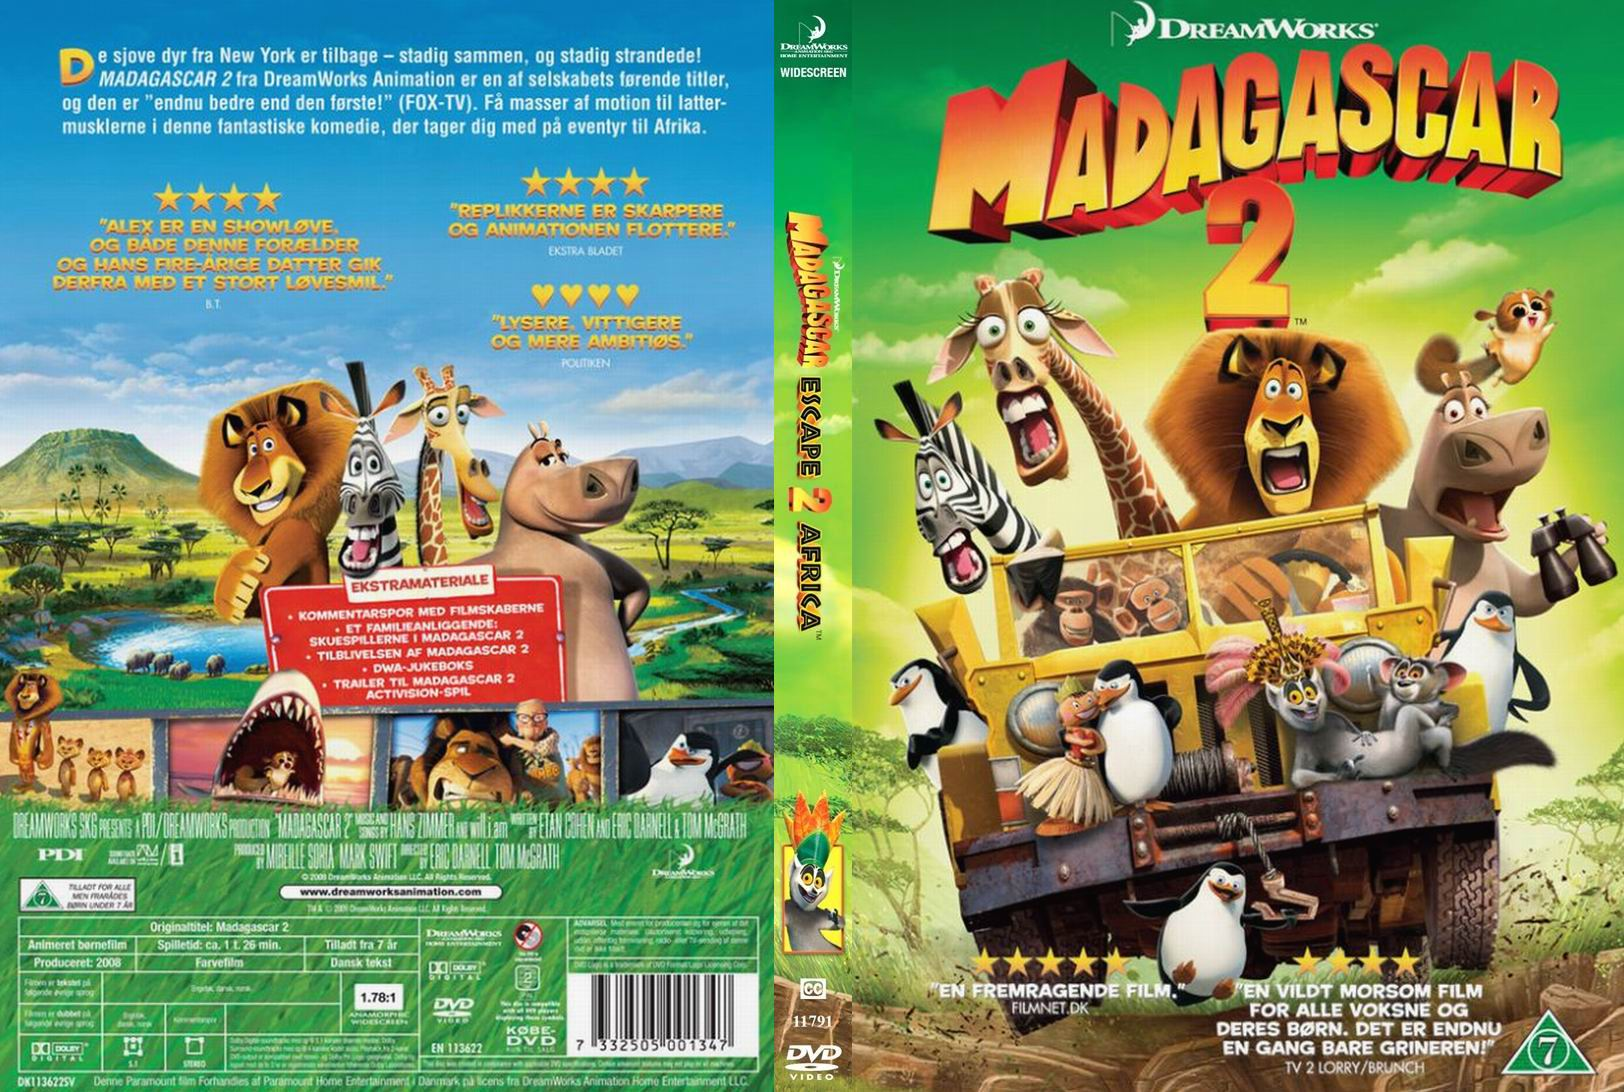 Covers Box Sk Madagascar Escape 2 Africa High Quality Dvd Blueray Movie